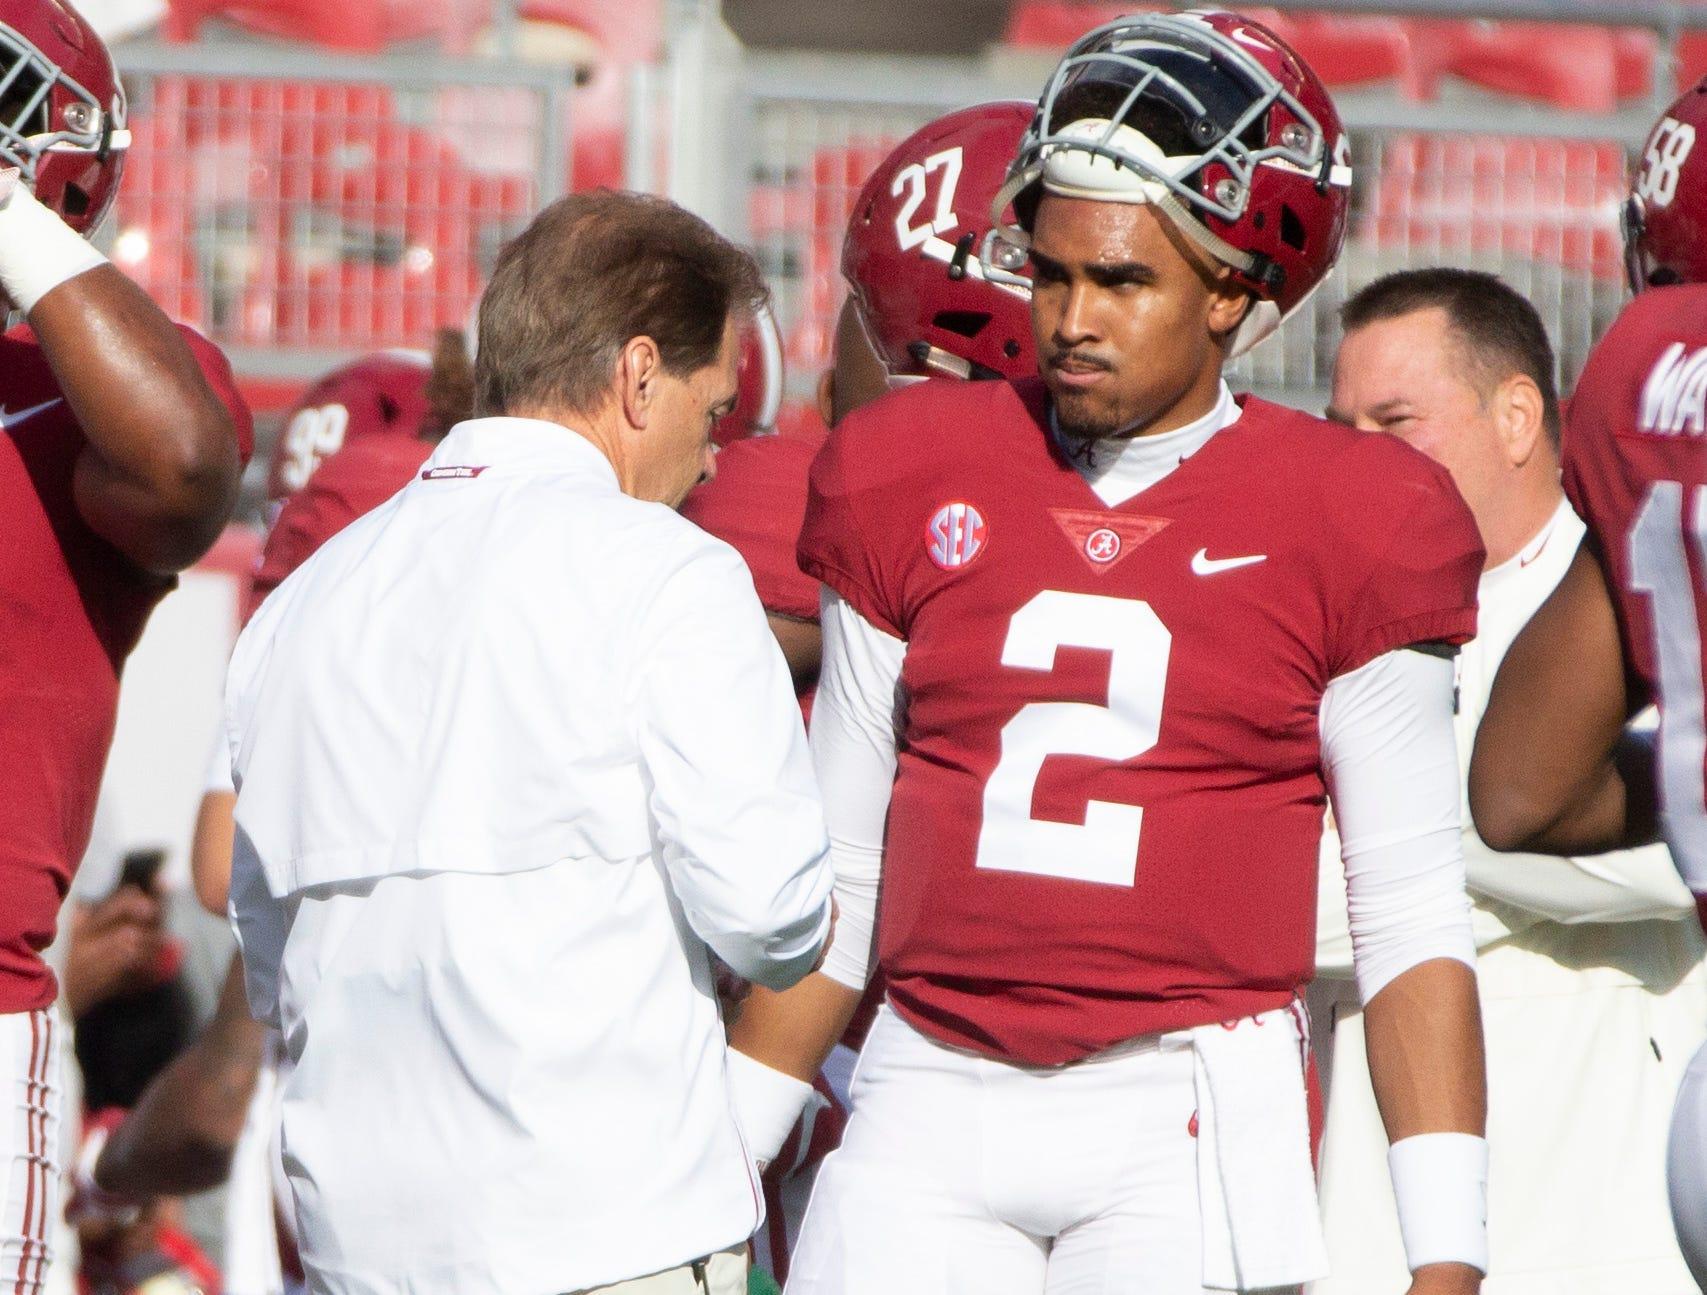 Alabama head coach Nick Saban talks with Jalen Hurts during a few practice drills.